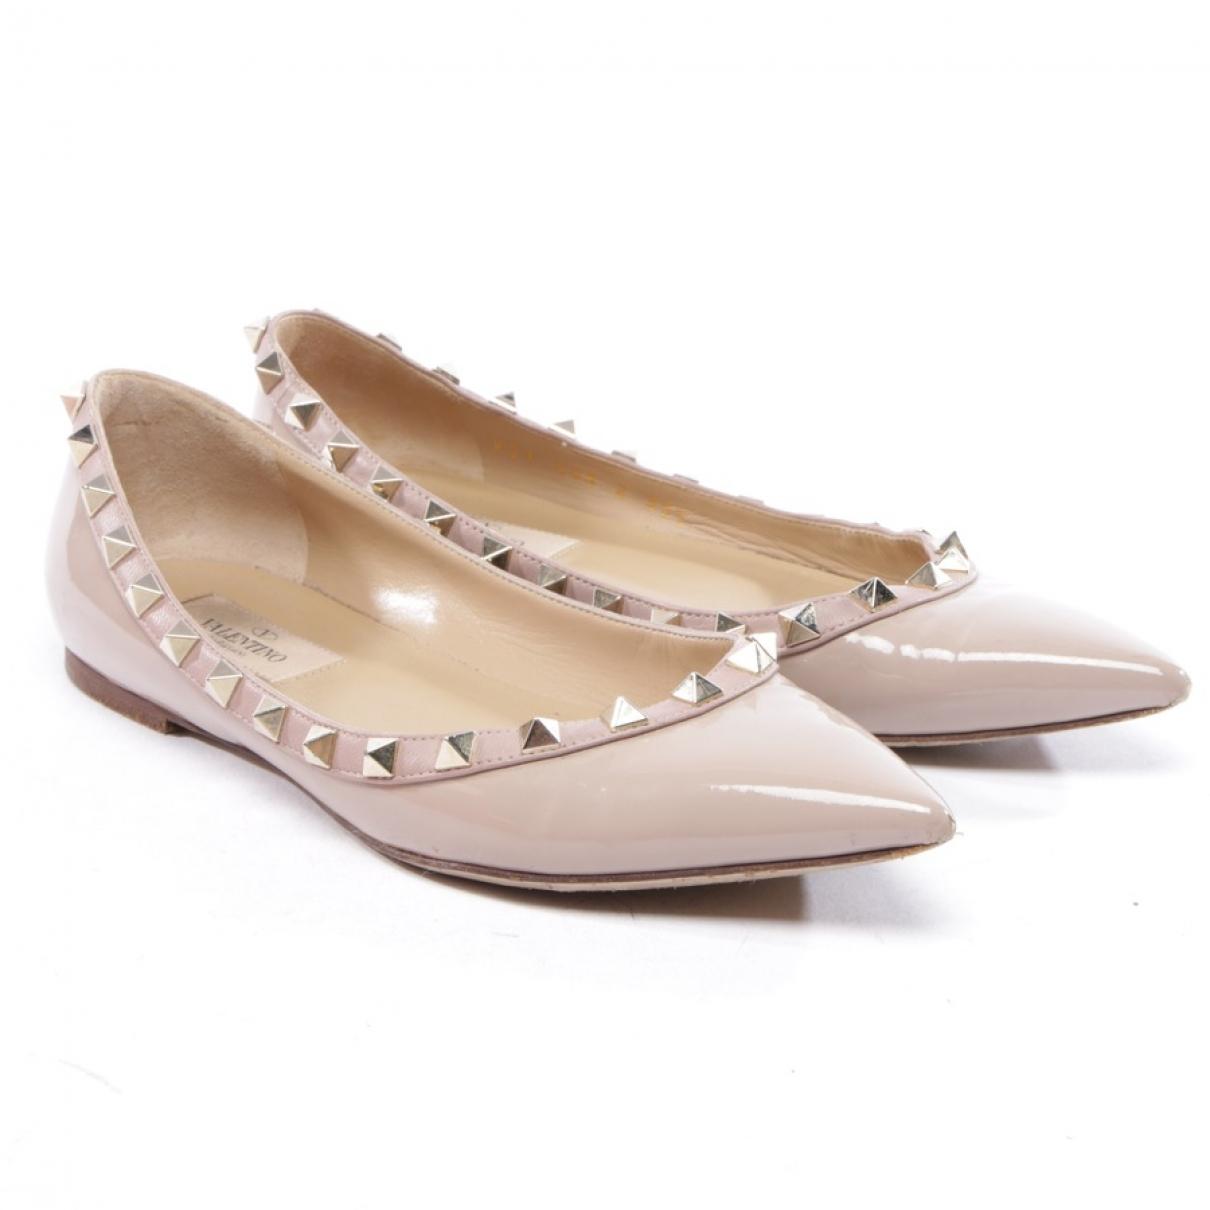 Valentino Garavani - Ballerines Rockstud pour femme en cuir verni - beige